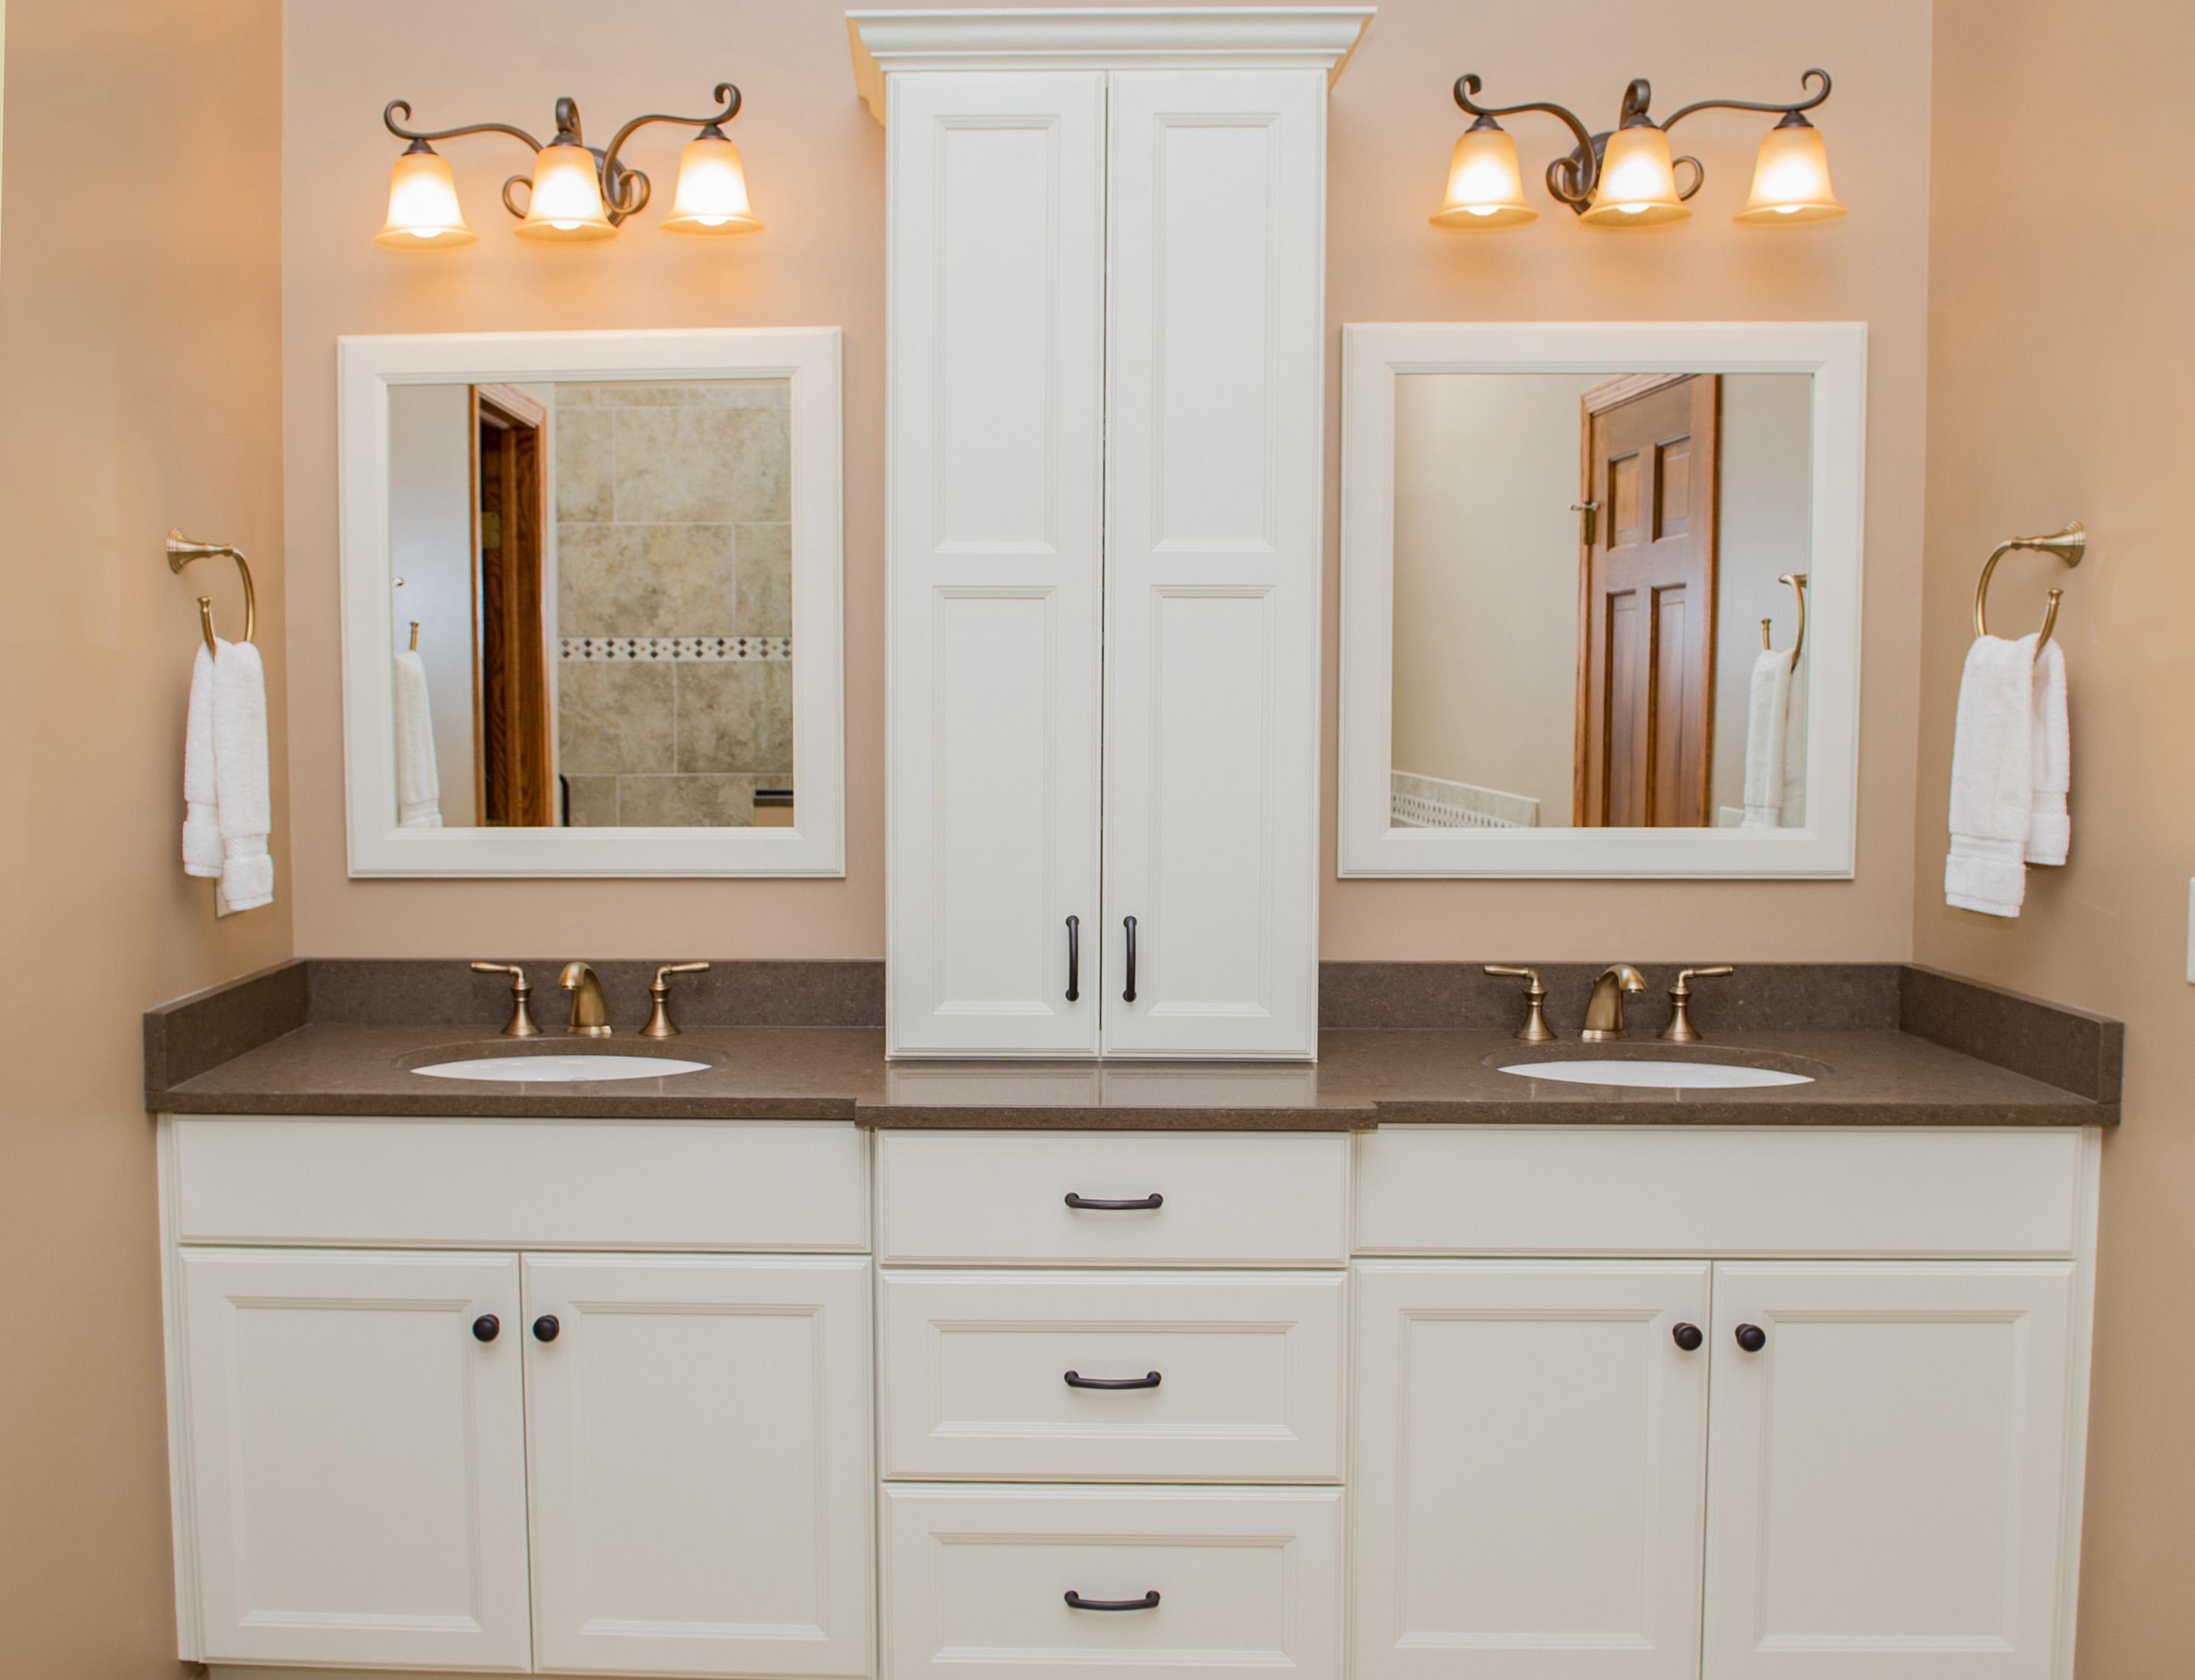 double vanity with storage tower. The Custom Cupboards double vanity En suite elegance in Plainfield  with storage tower fruitesborras com 100 Double Vanity With Storage Tower Images